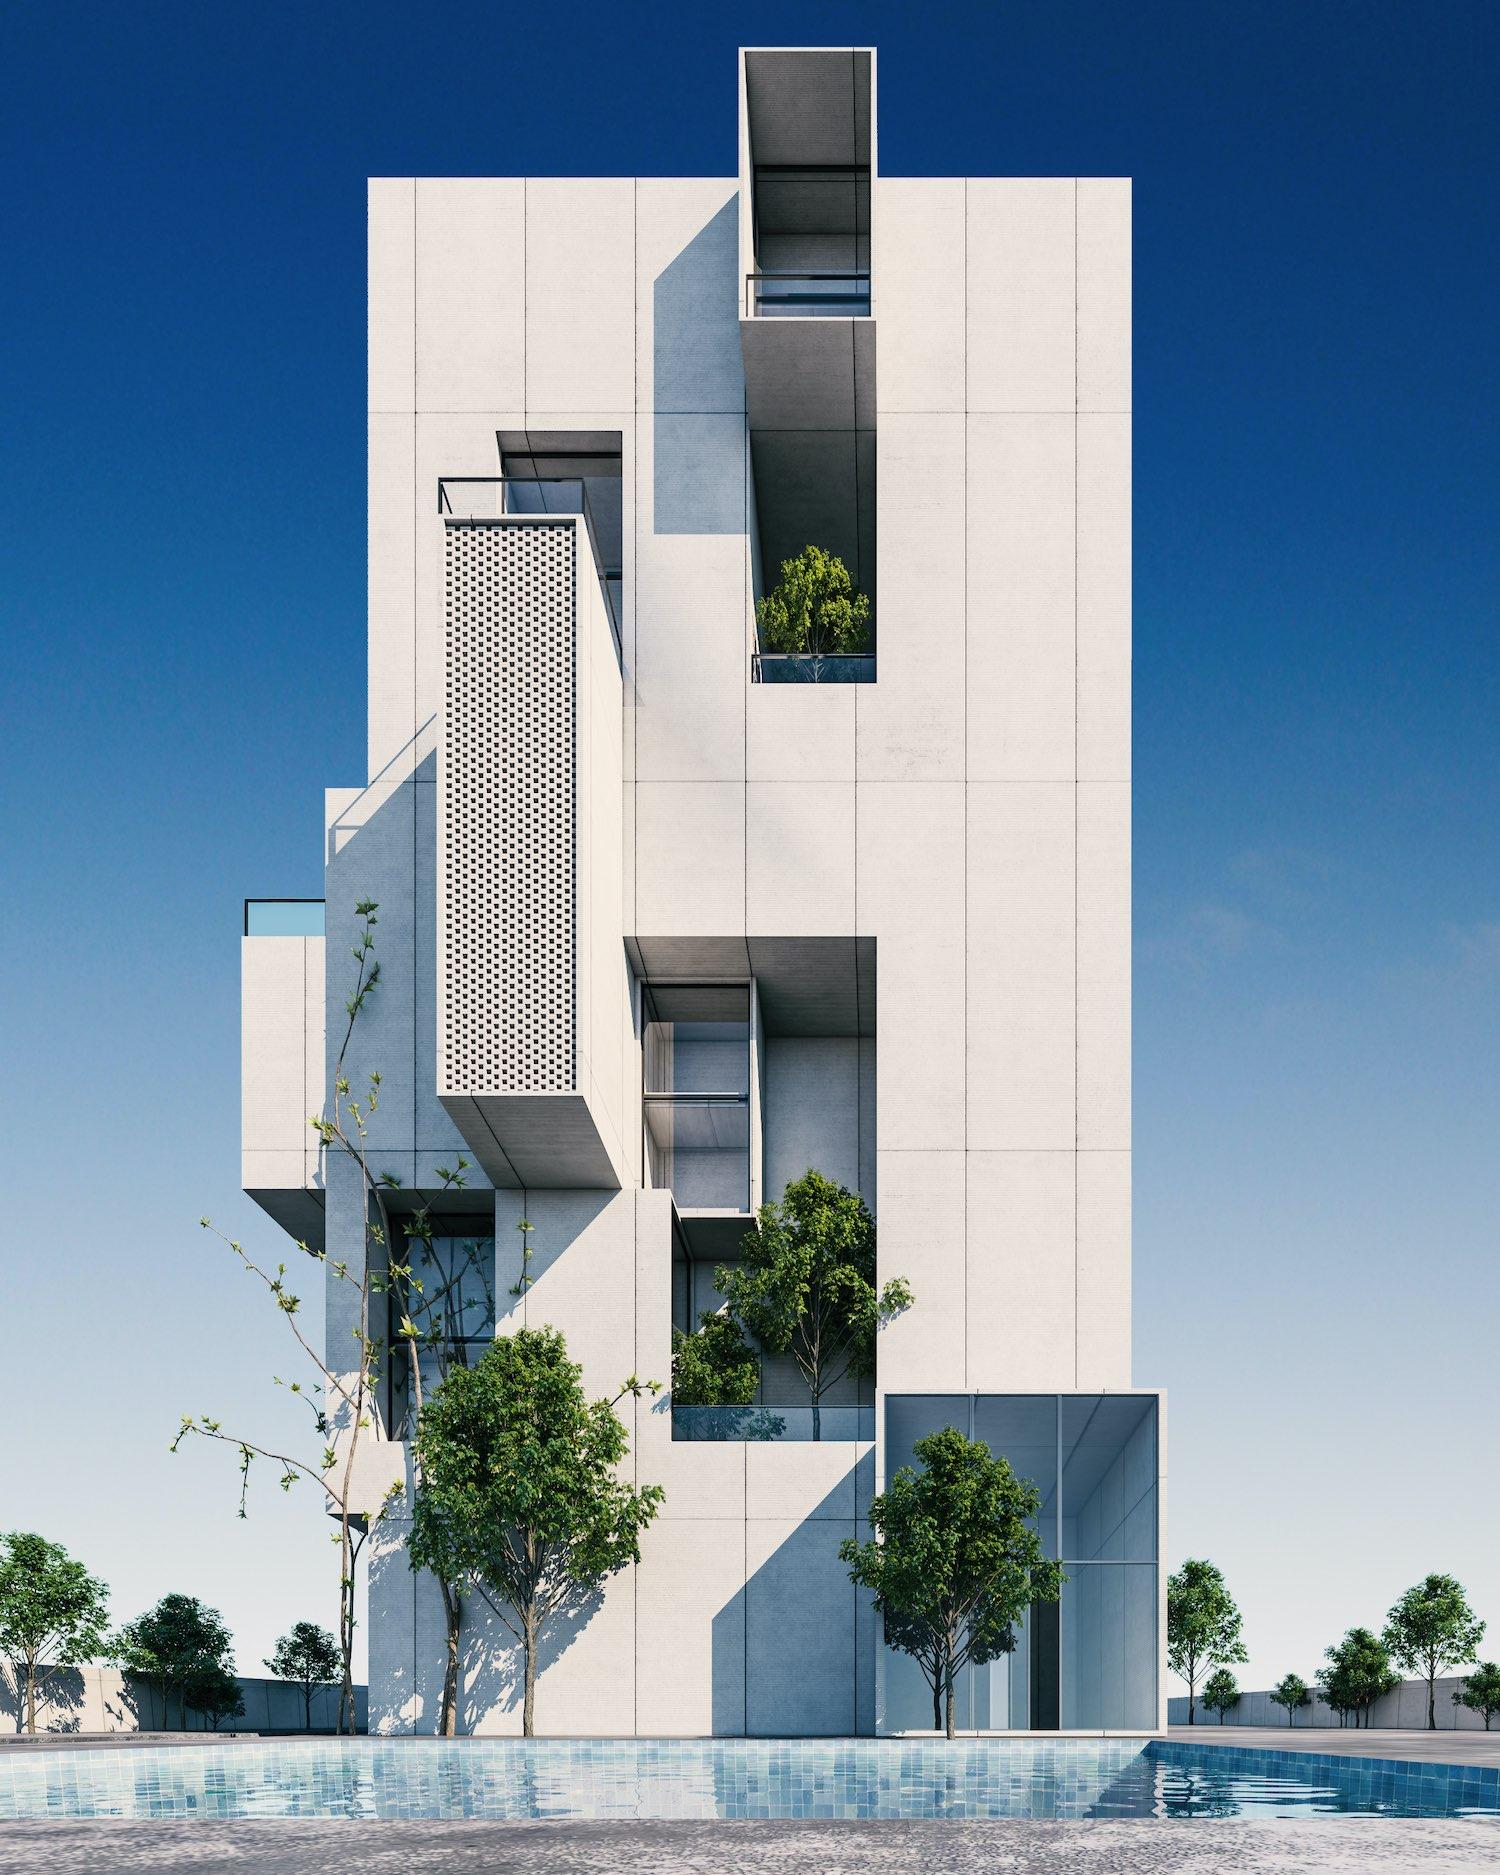 Valanjak Residential Building/Foto: Saeb Alimmohammadi